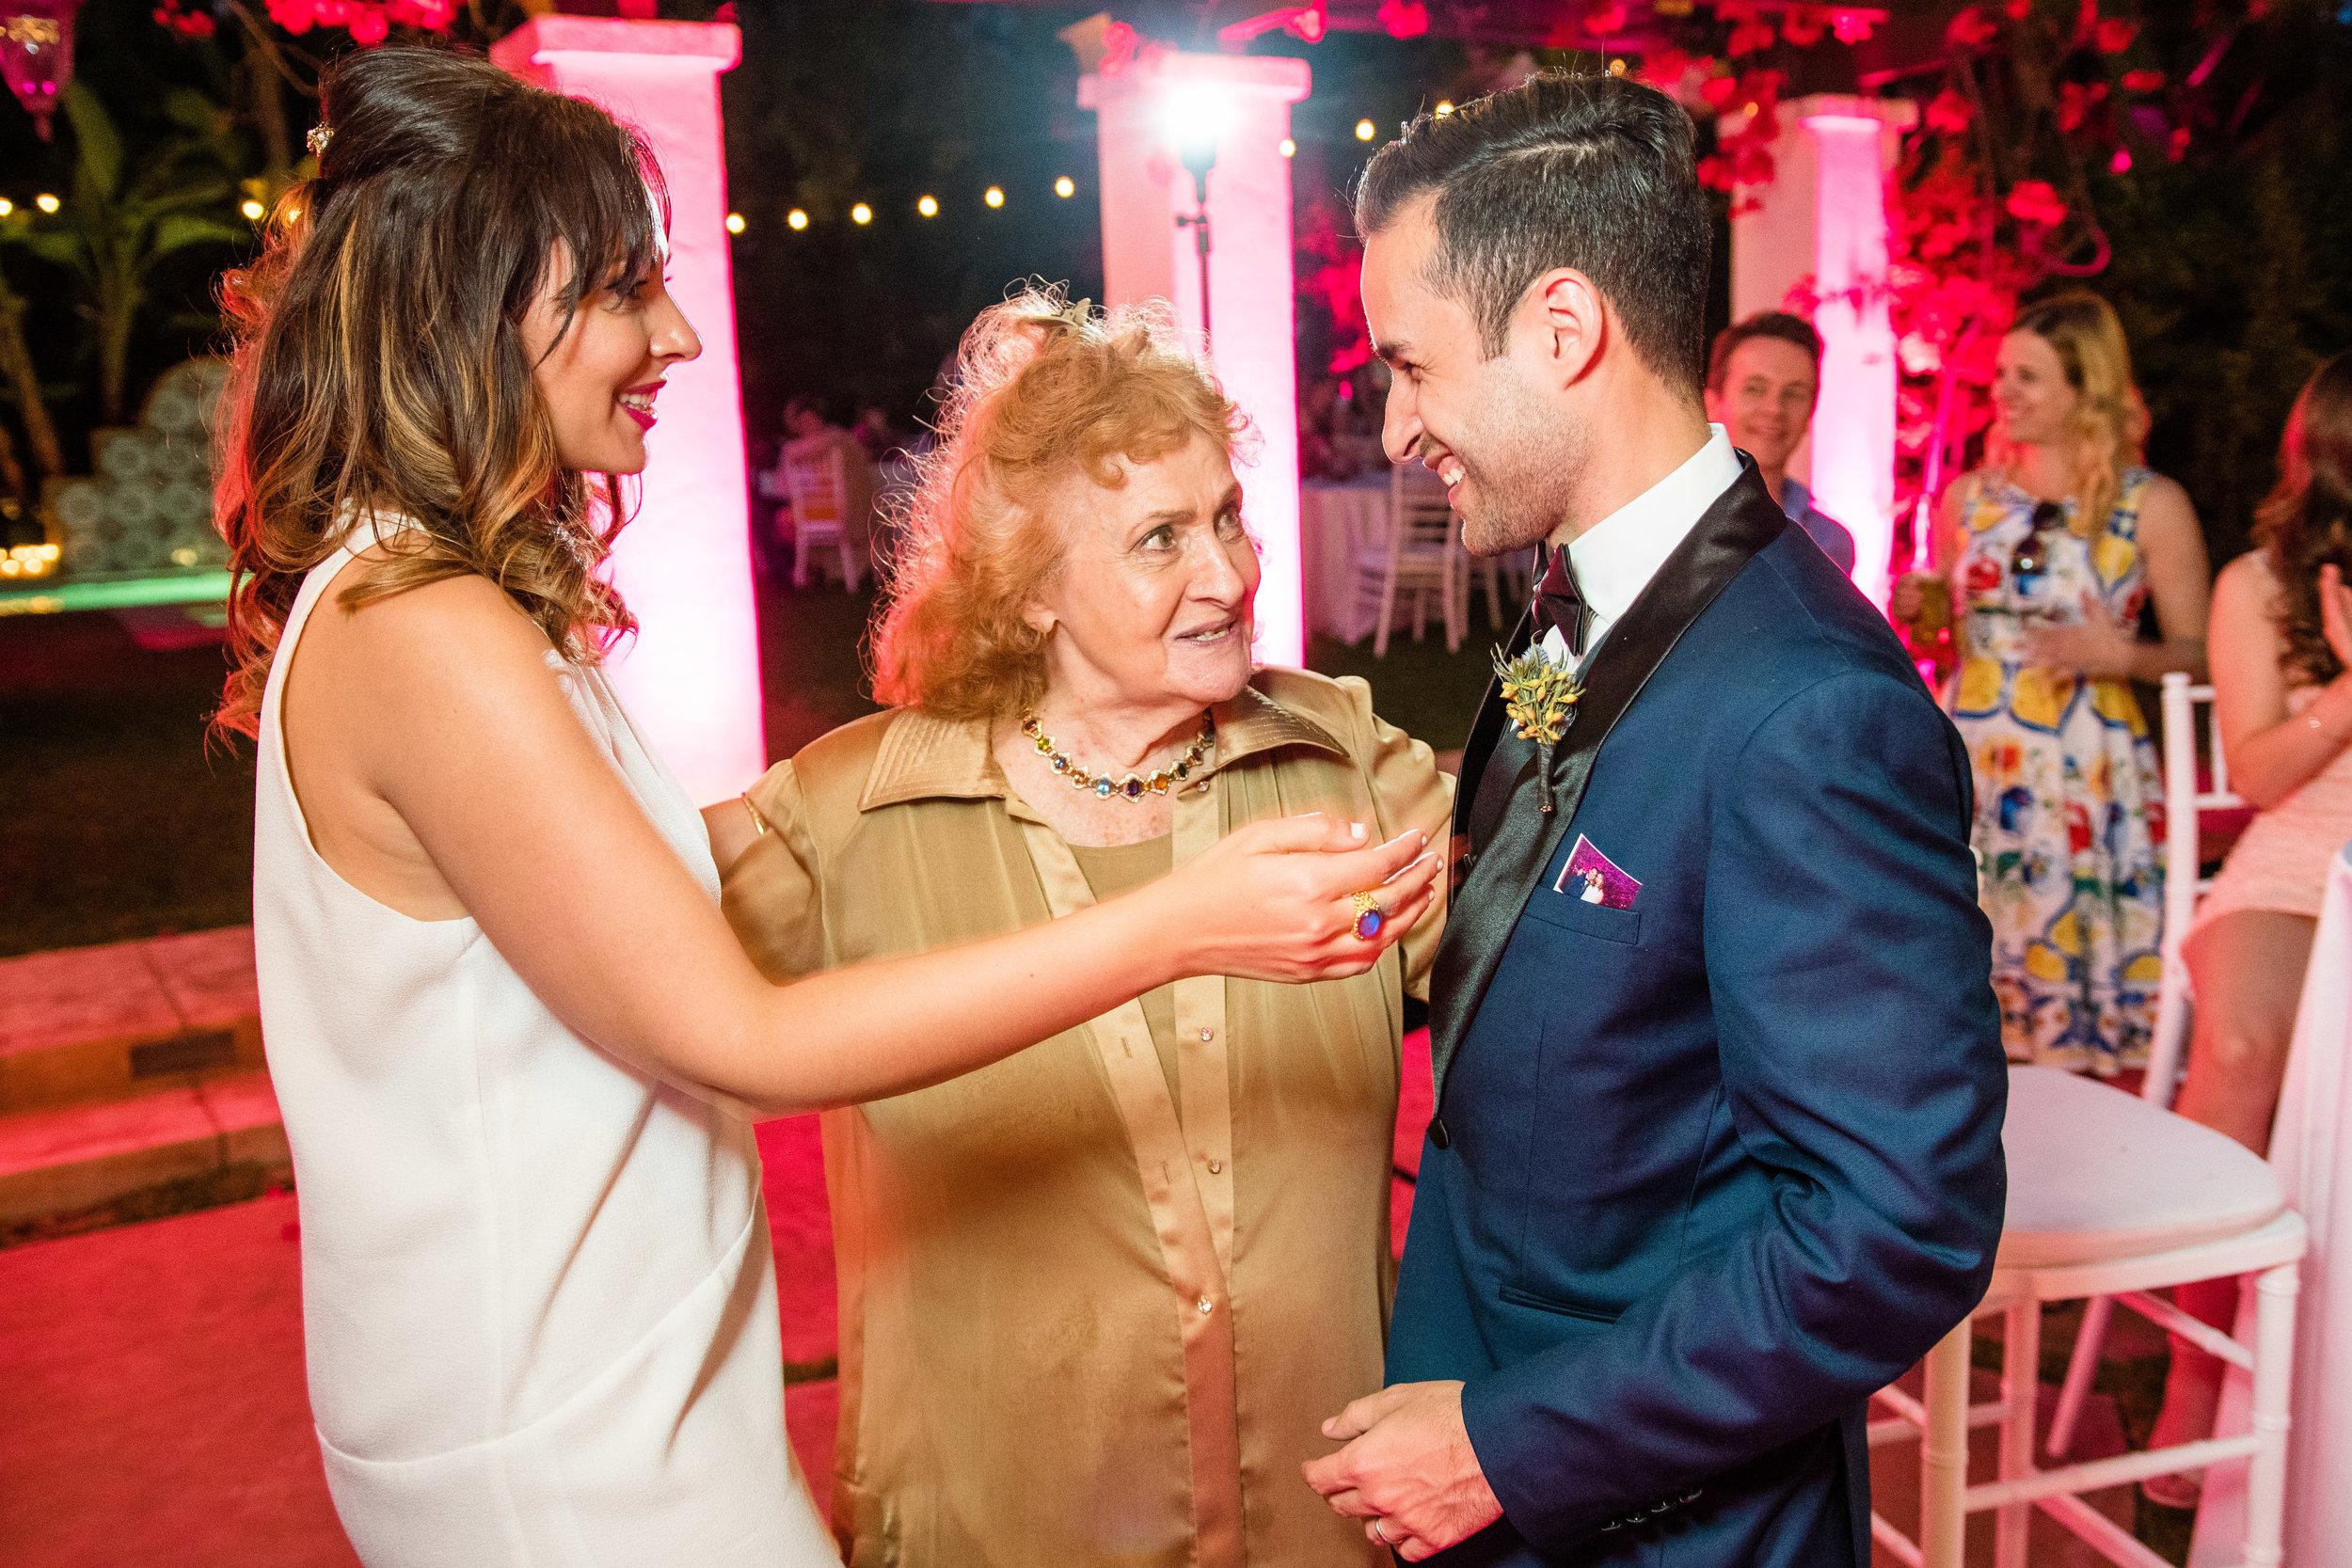 Vibrant Fiesta Backyard Wedding Reception grandmother with bride and groom.jpg